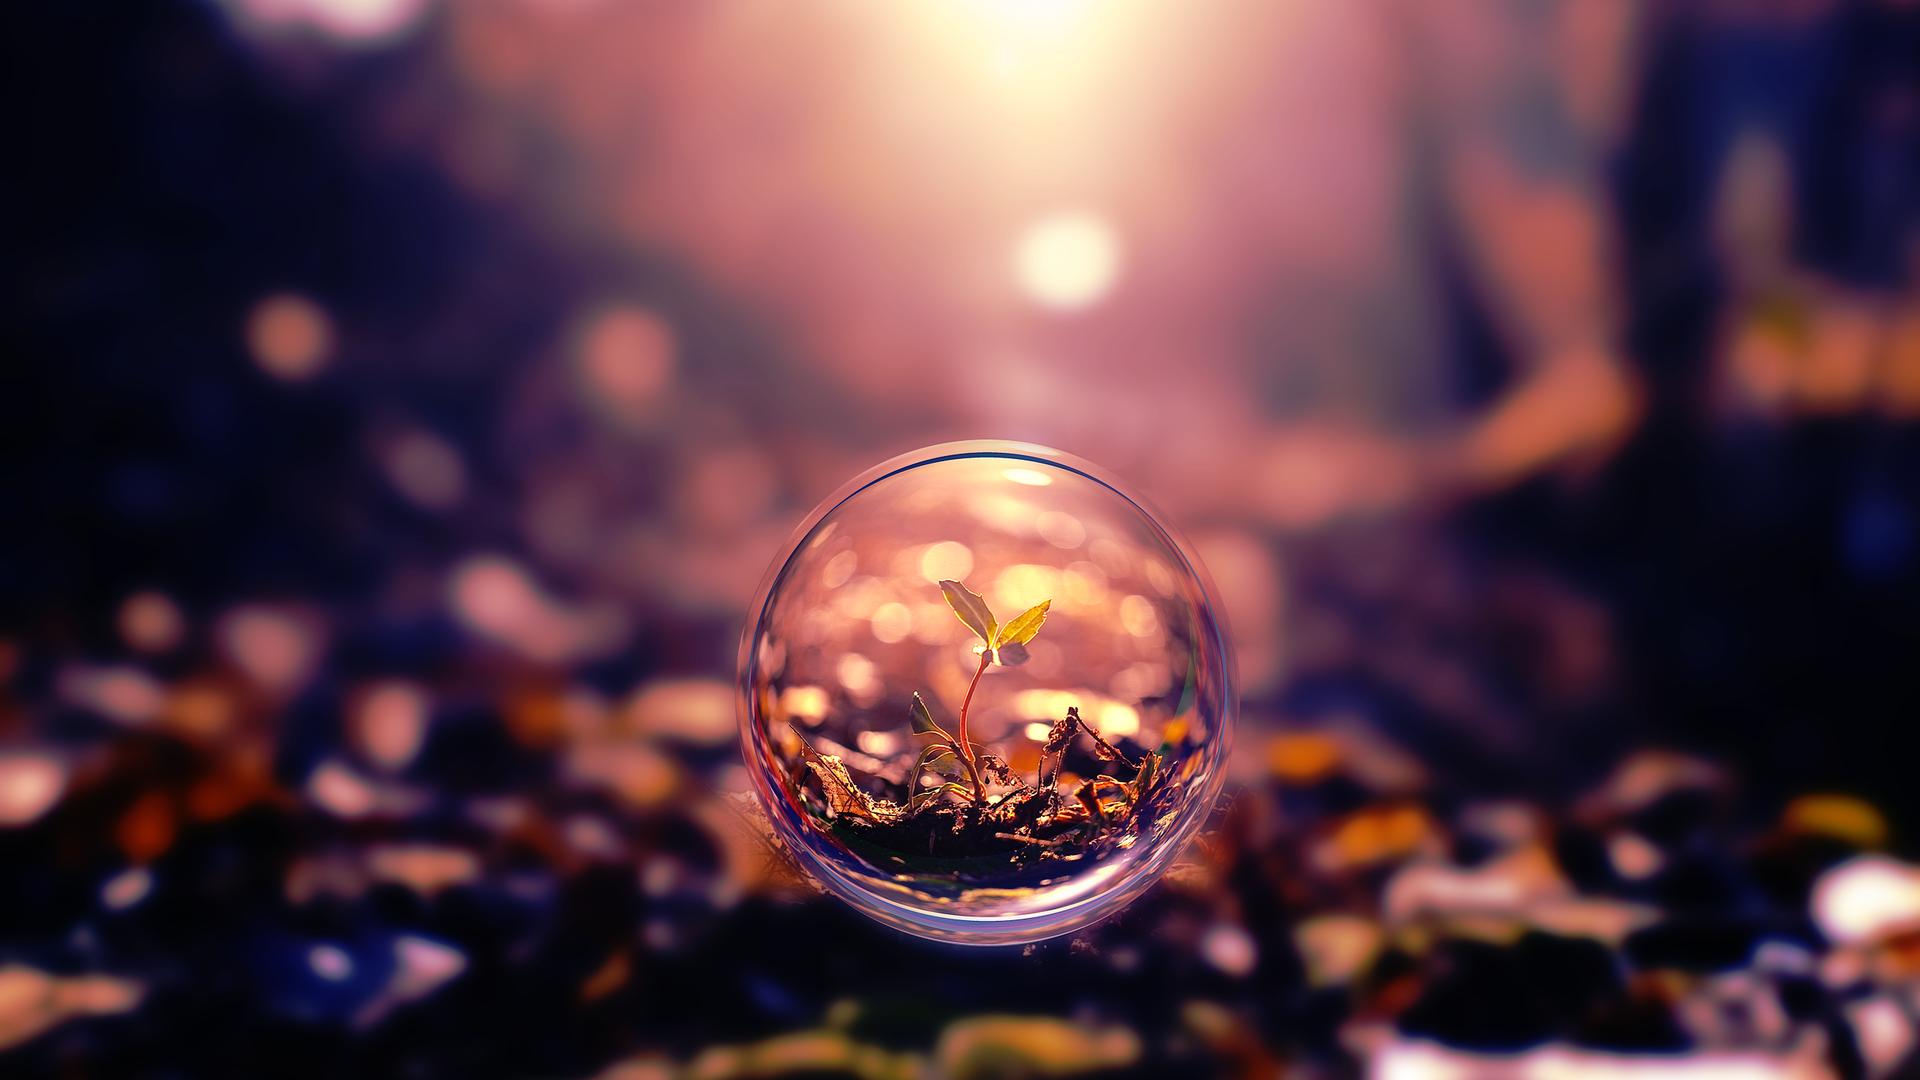 hd-bubble-.png